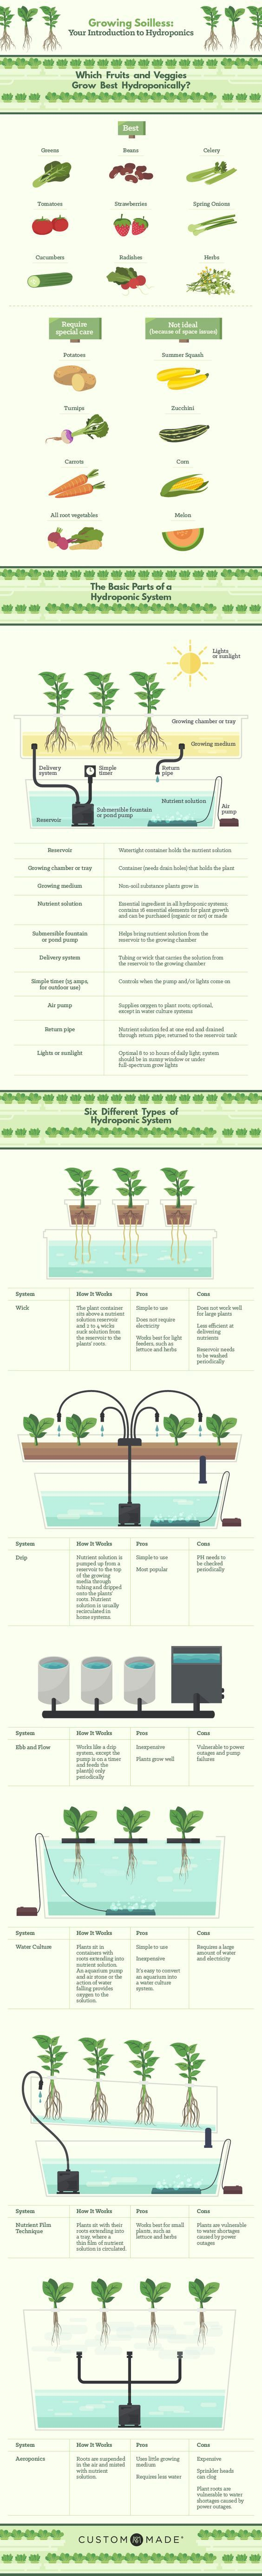 A Beginner's Handy Guide to Hydroponic Gardening: http://homeandgardenamerica.com/hydroponic-gardening-for-beginners